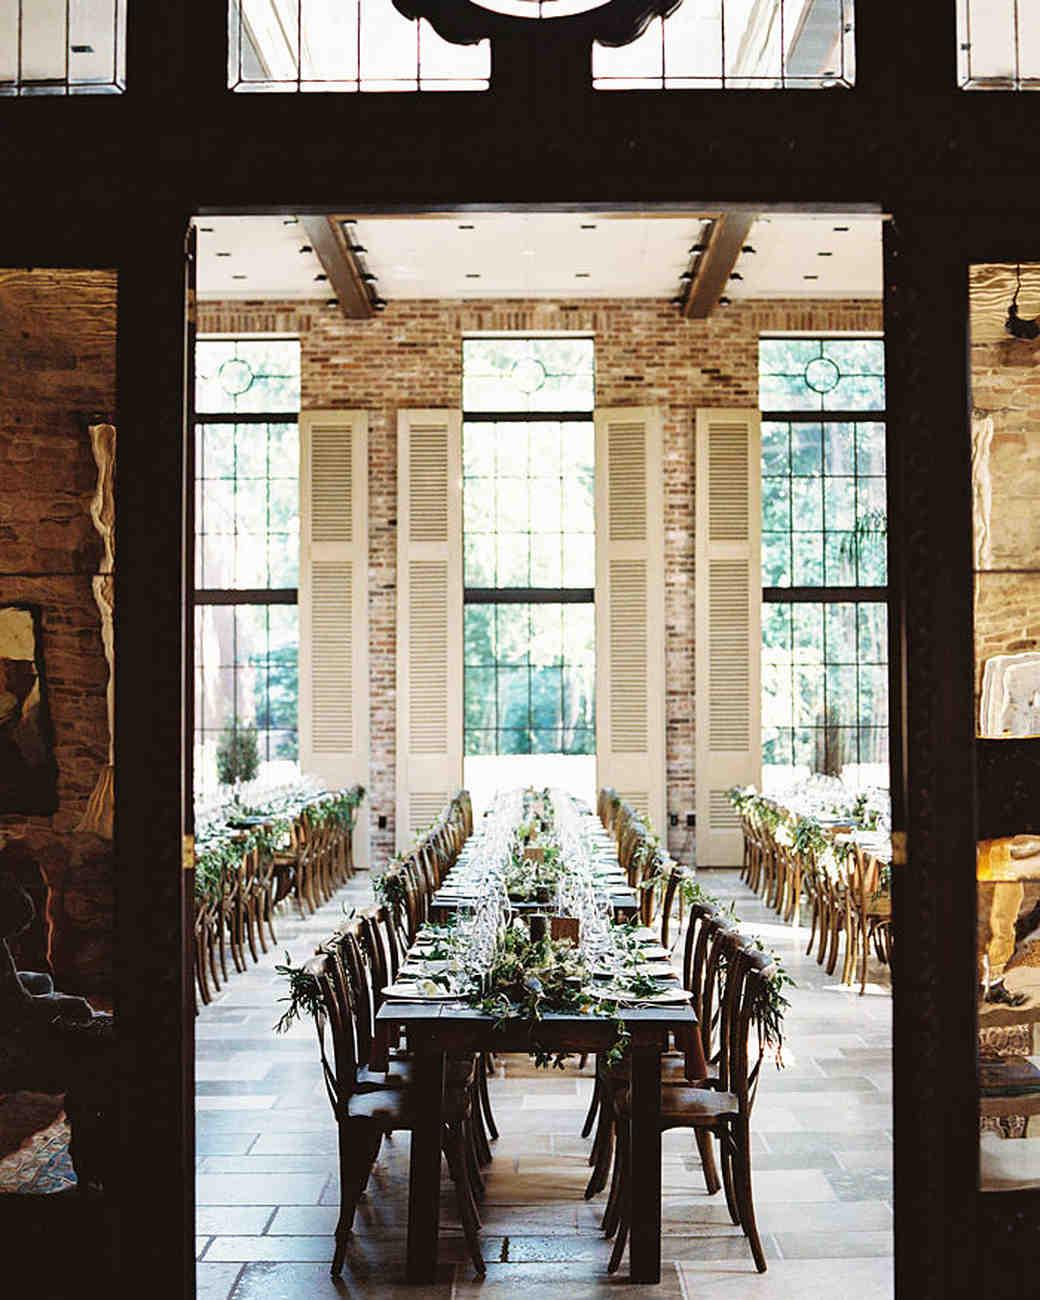 jess-levin-wedding-venue-tips-6-0316.jpg